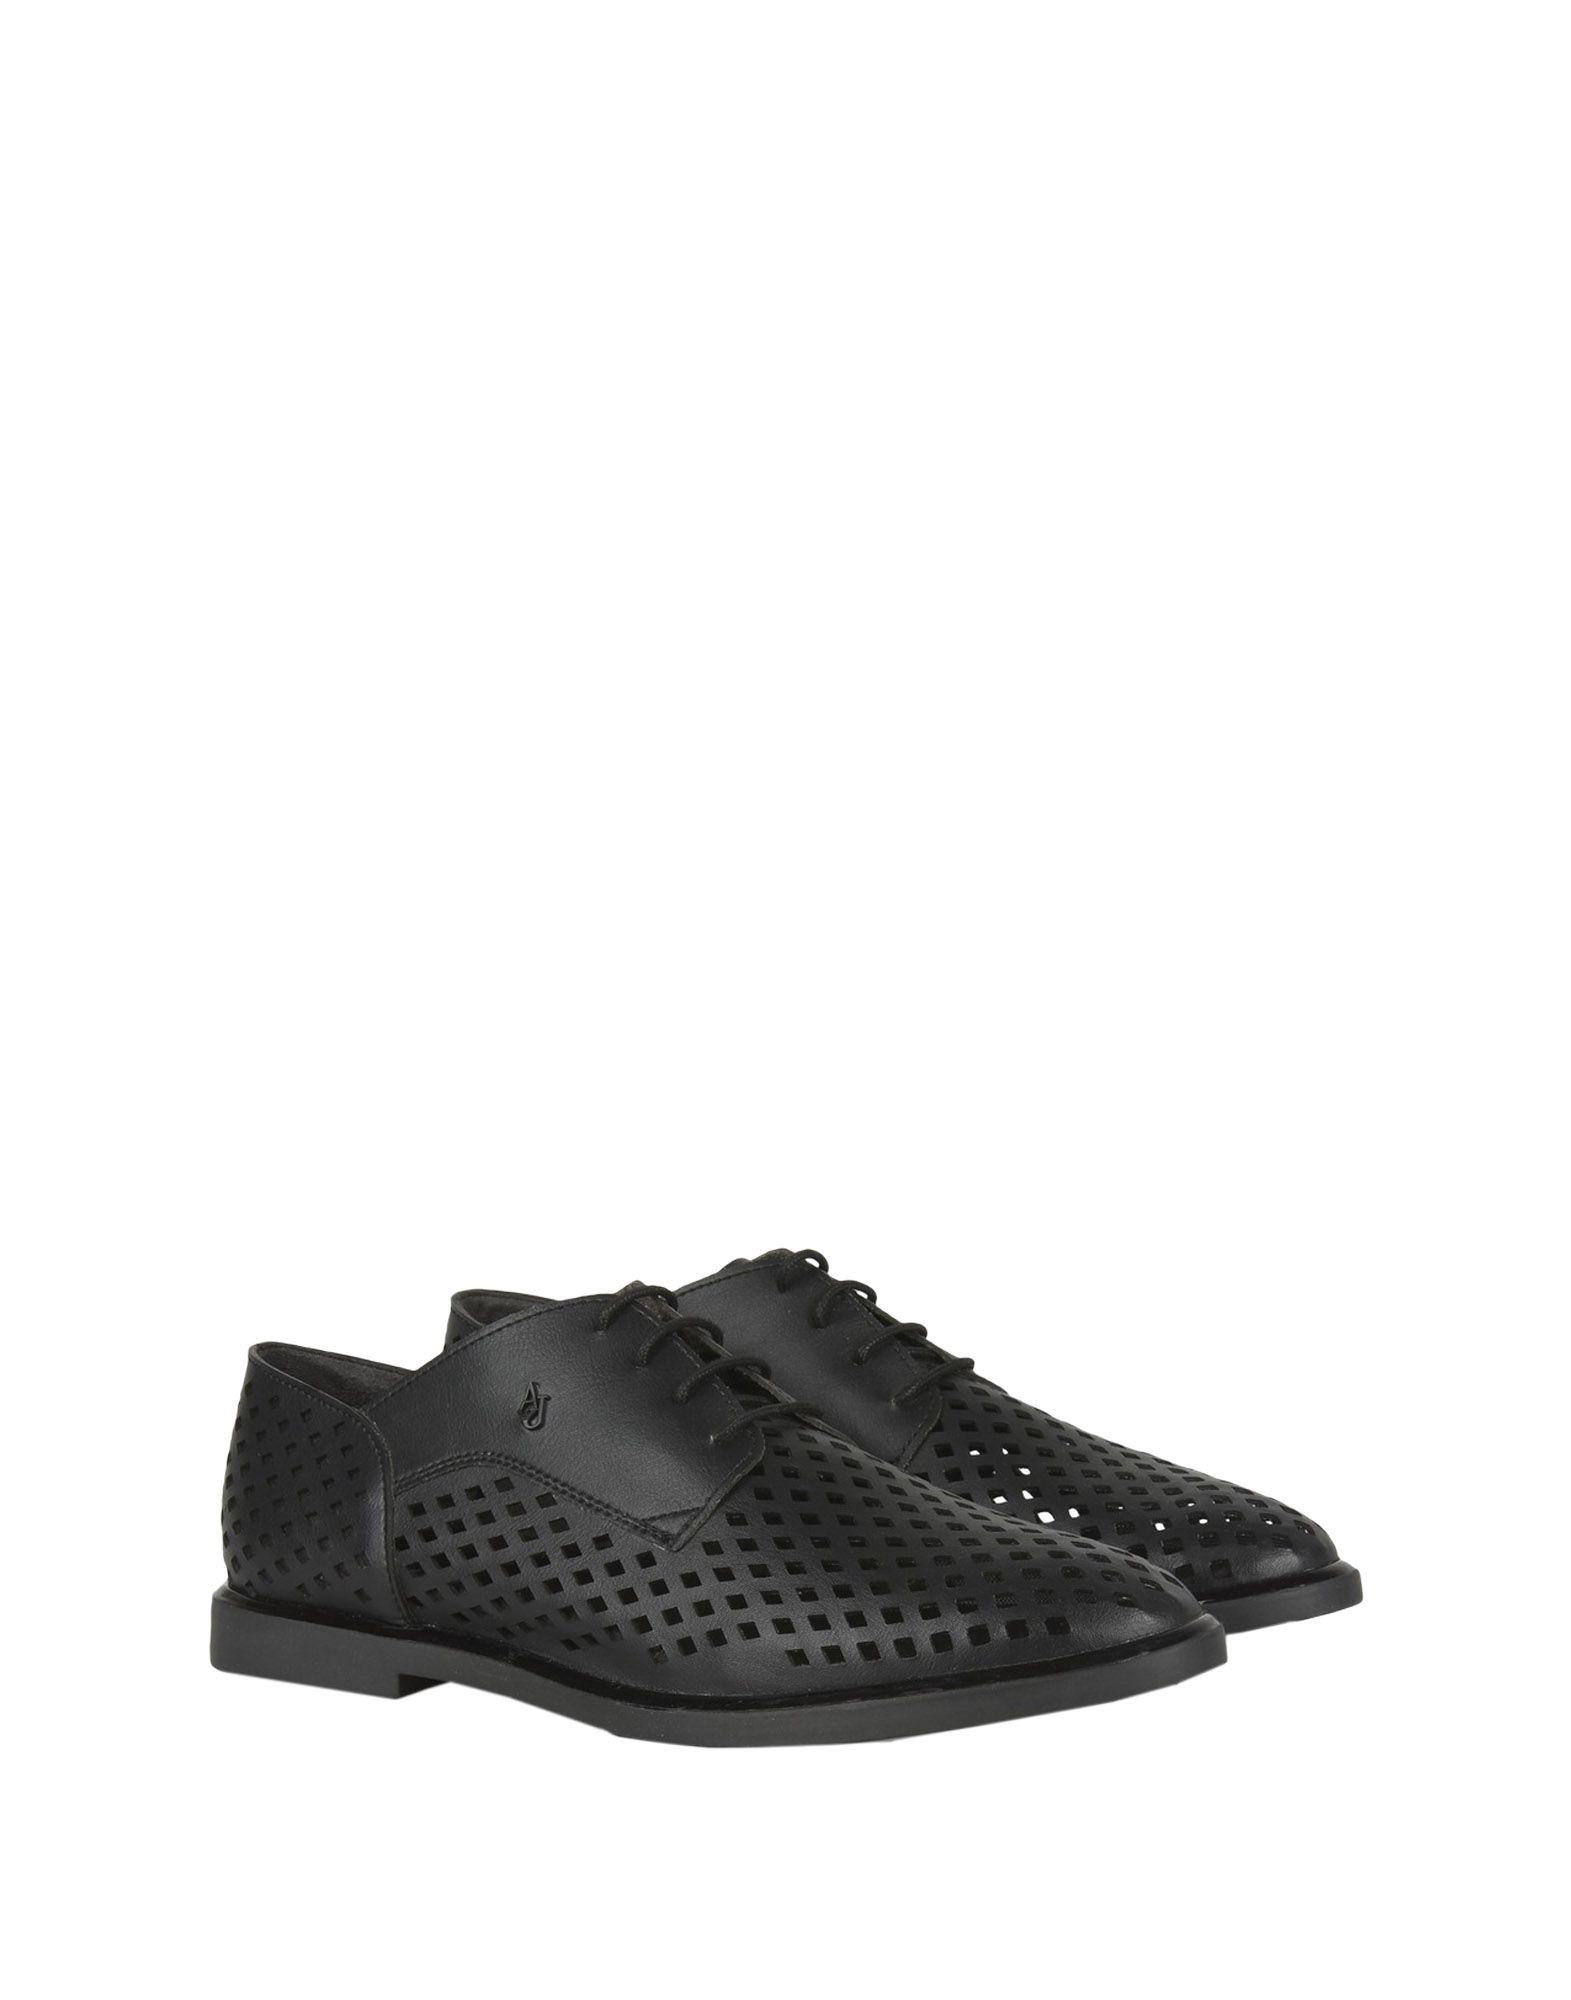 Armani Jeans Schnürschuhe Damen  11442312MD Gute Qualität beliebte Schuhe